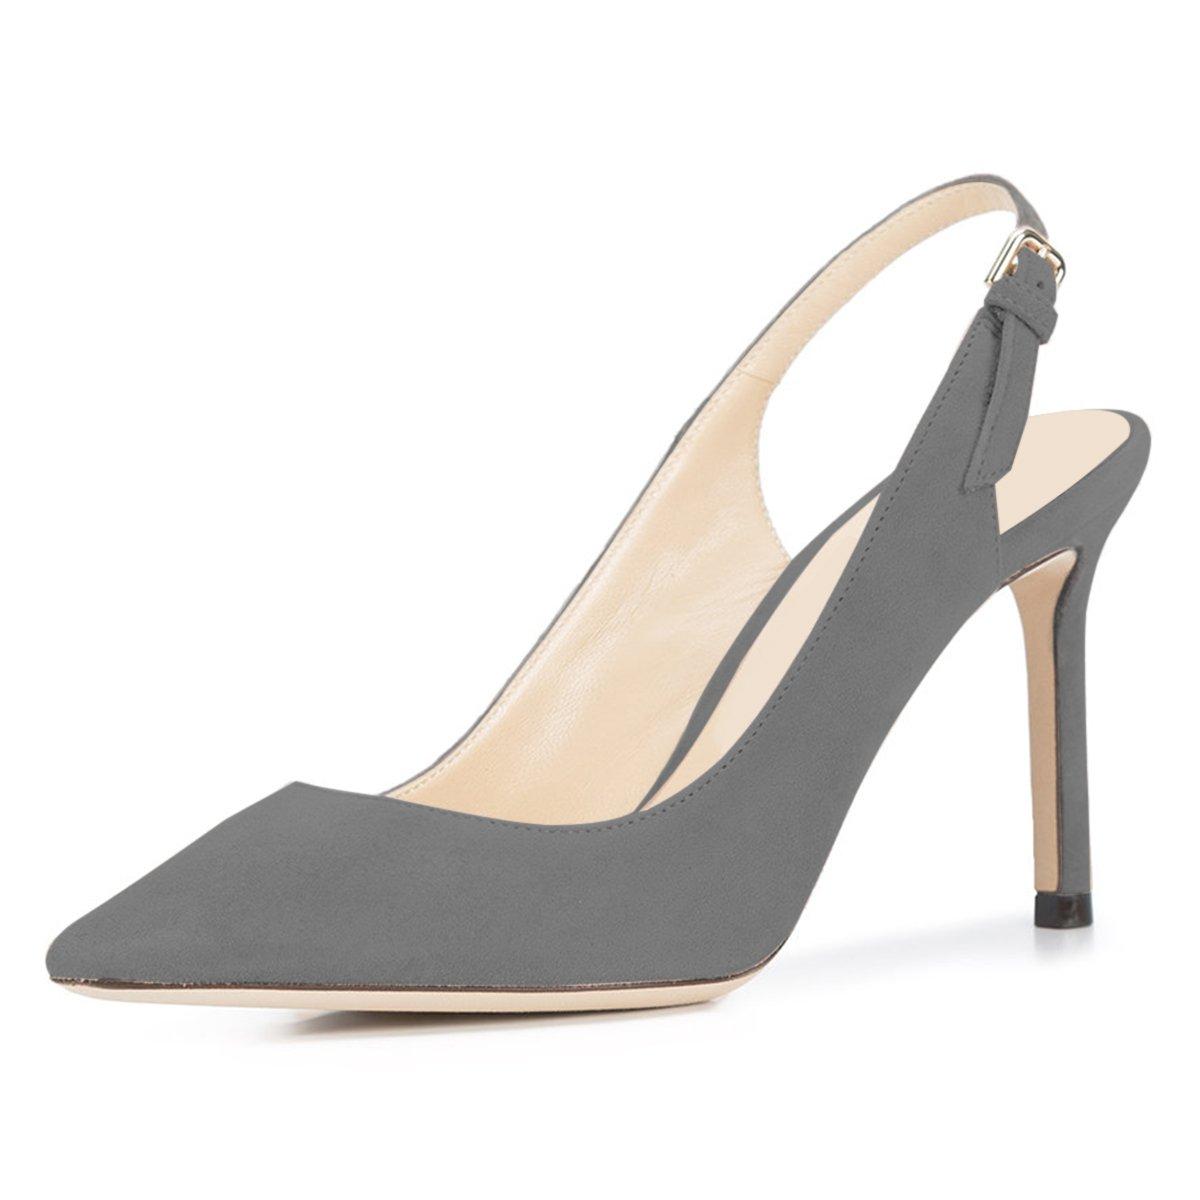 NJPU Women Pointed Toe Slingback Pumps Stiletto High Heels Office Shoes with Buckle B07C2JVSR2 6 B(M) US|Grey